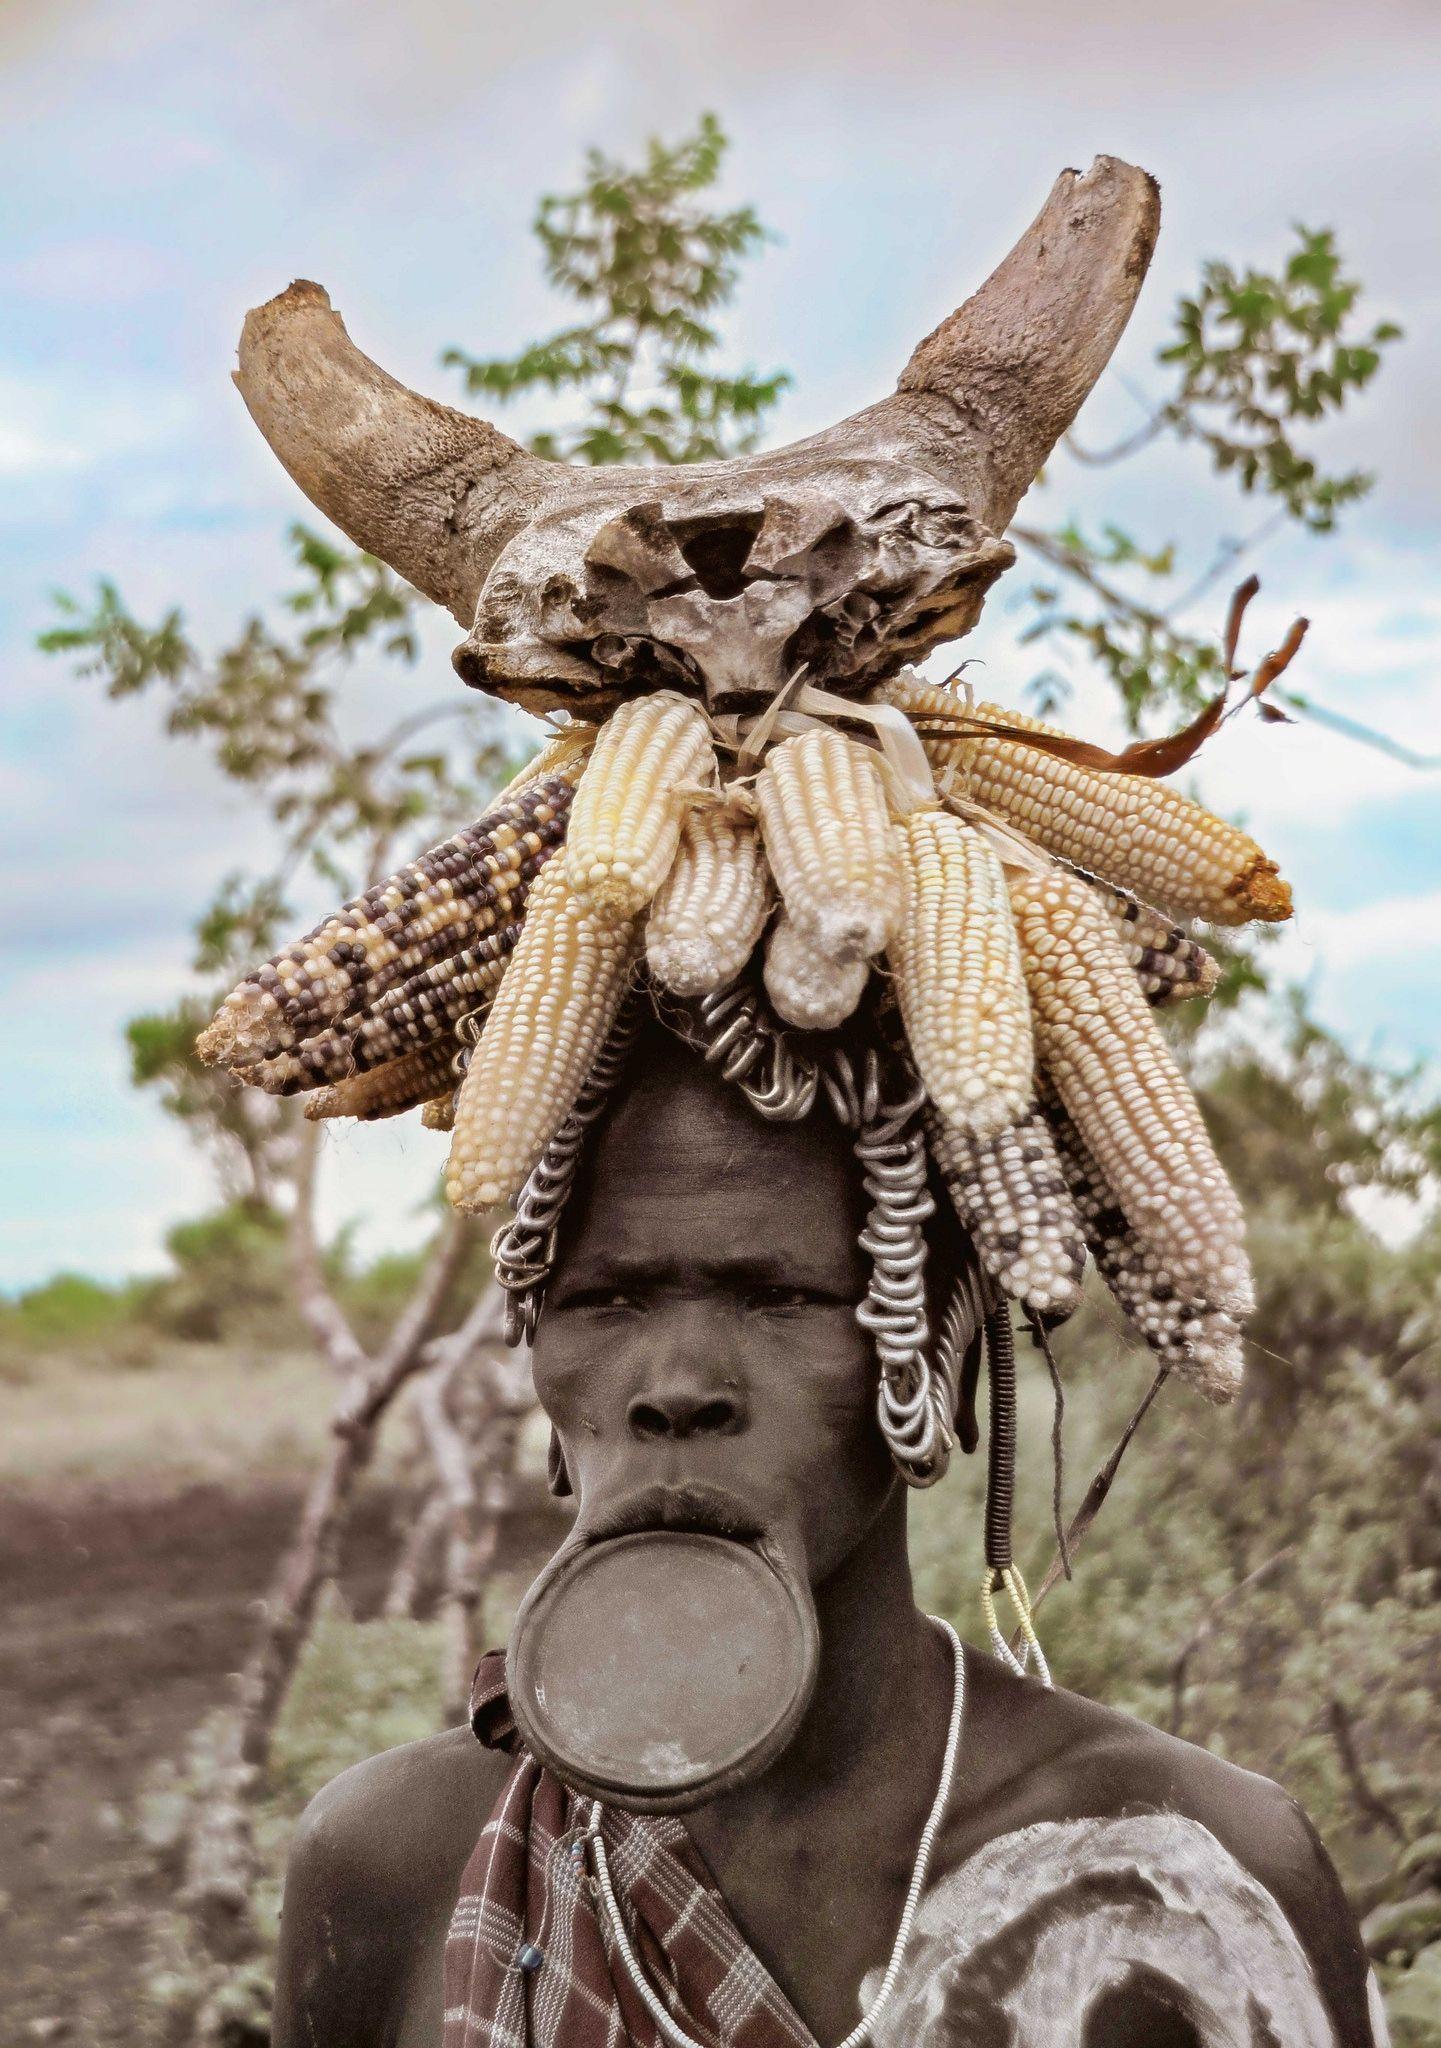 Mursi Tribe, Ethiopia - The homies ✨ #Ethiopia #homies #Mursi #Tribe #AfricanTribes #African #Tribes